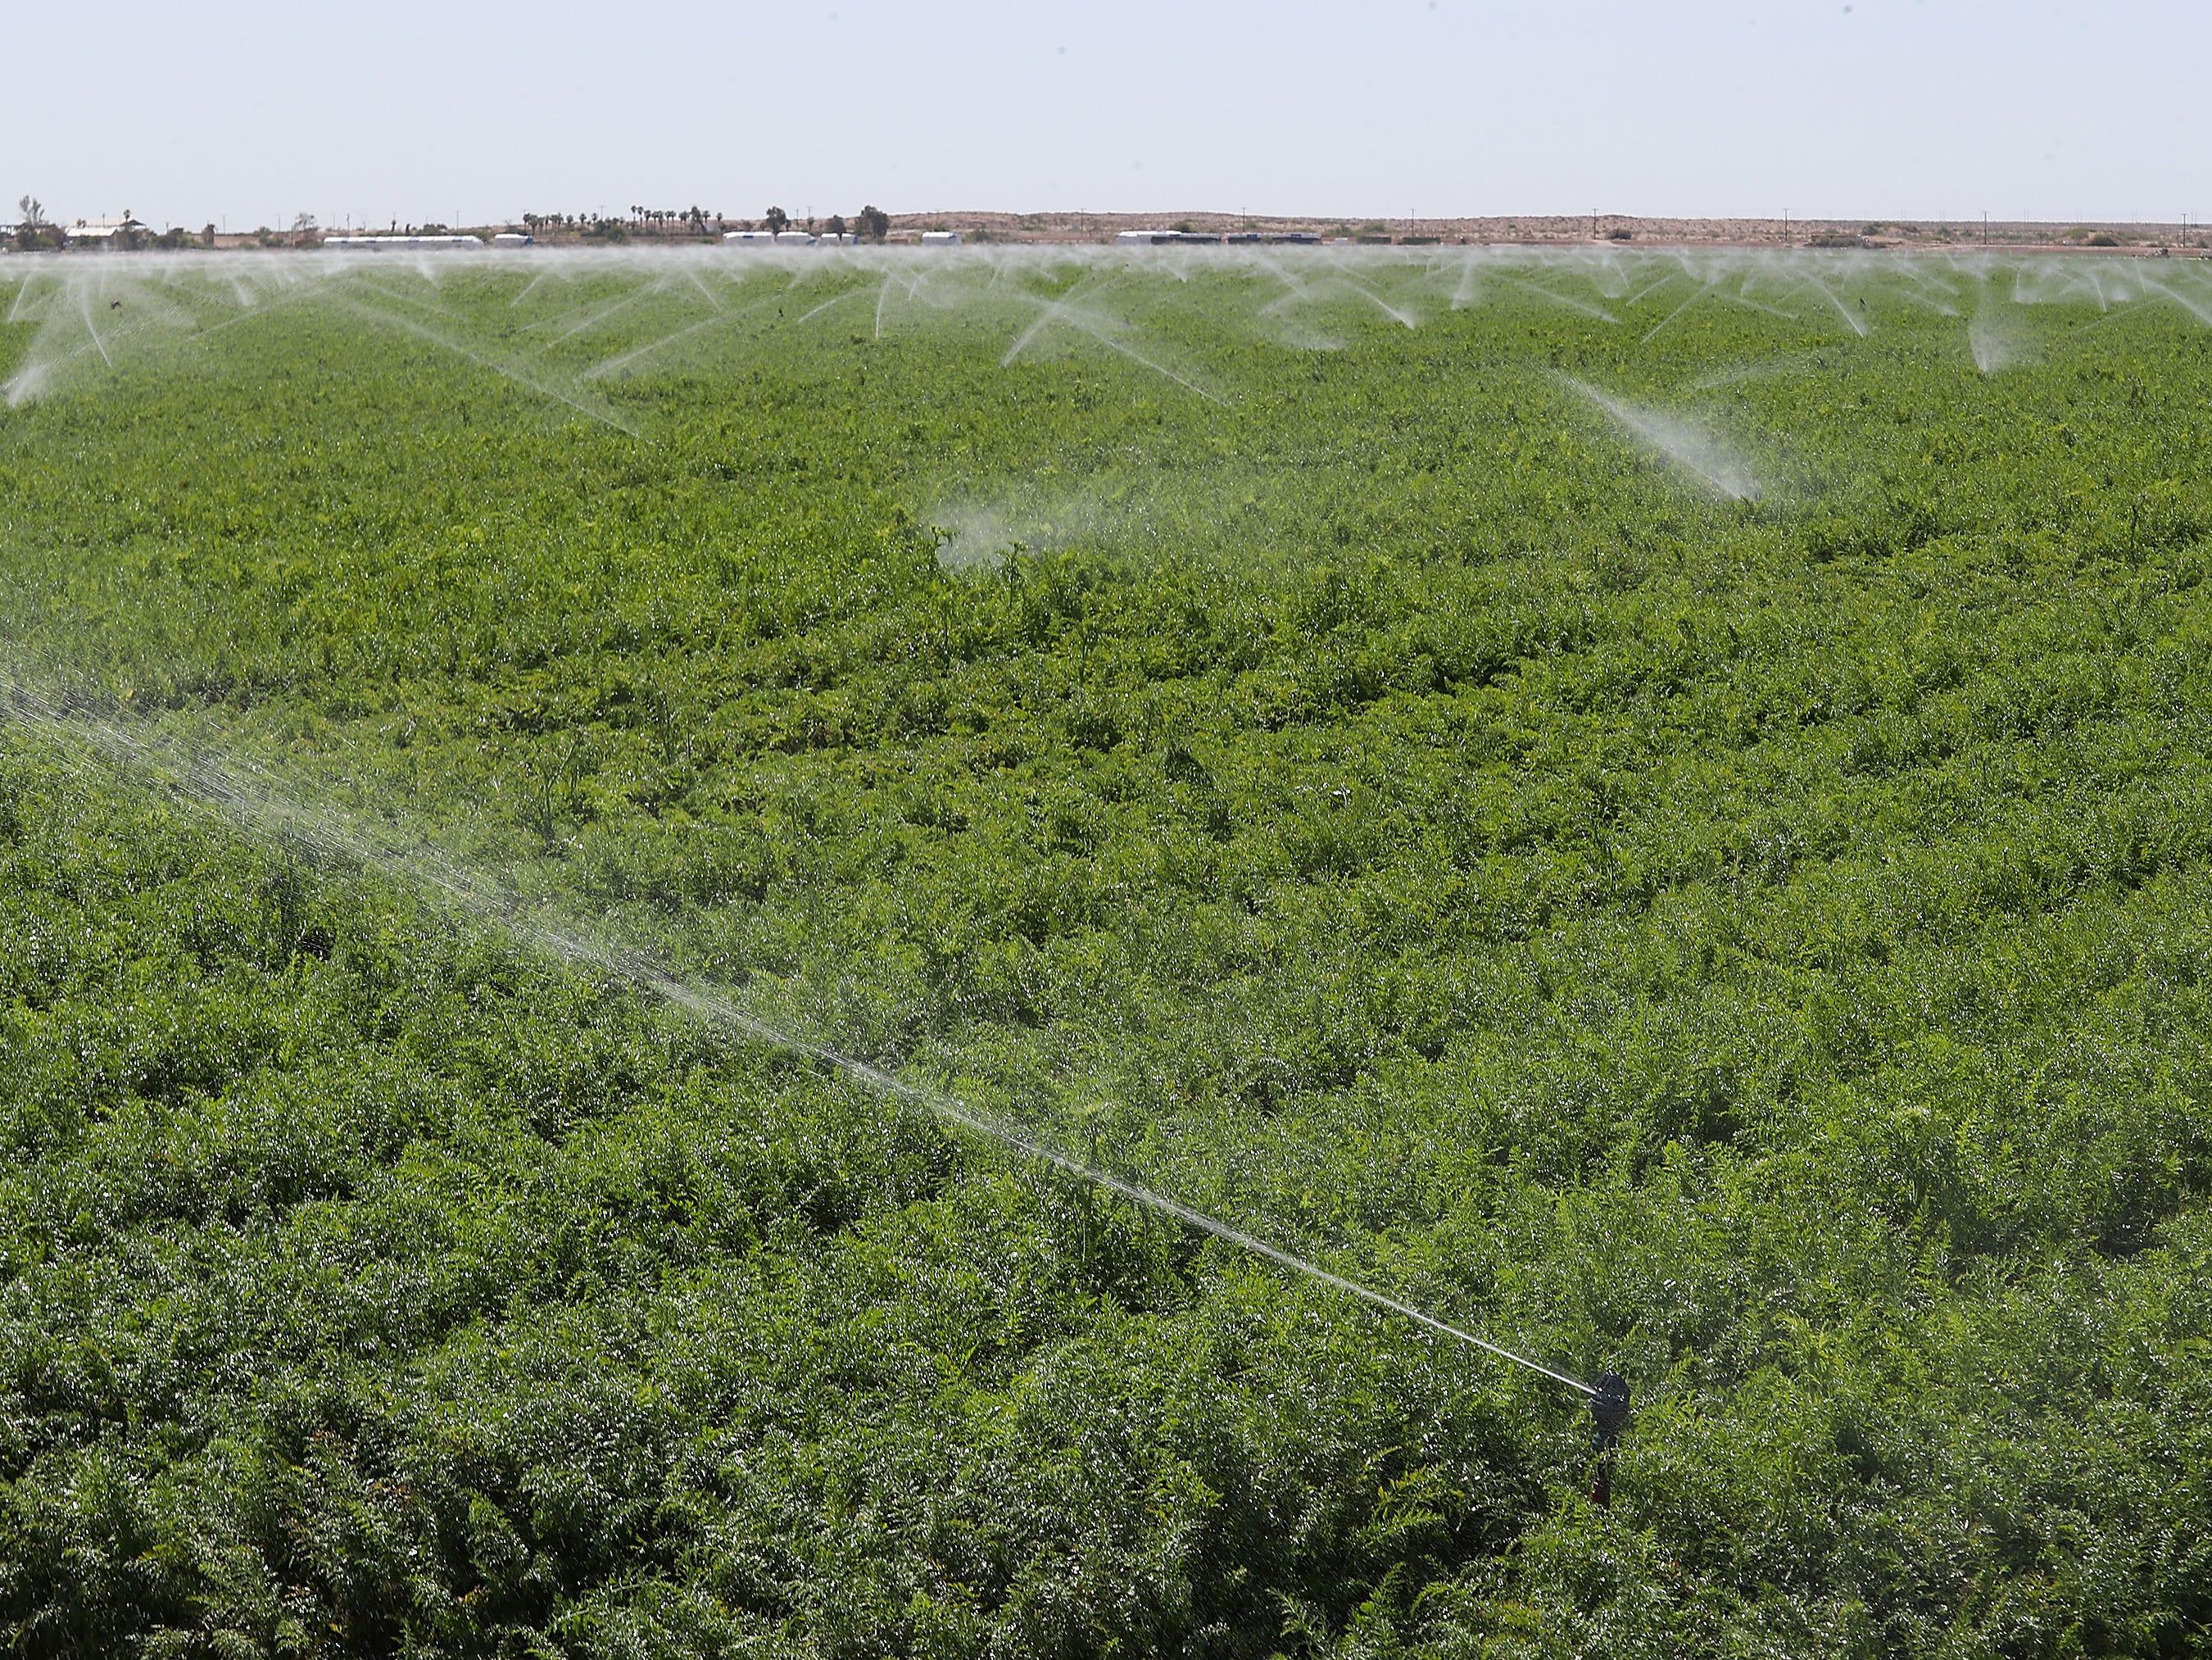 Farm land is irrigated on the Elmore Desert Ranch which abuts the Salton Sea near Brawley, April 11, 2019.